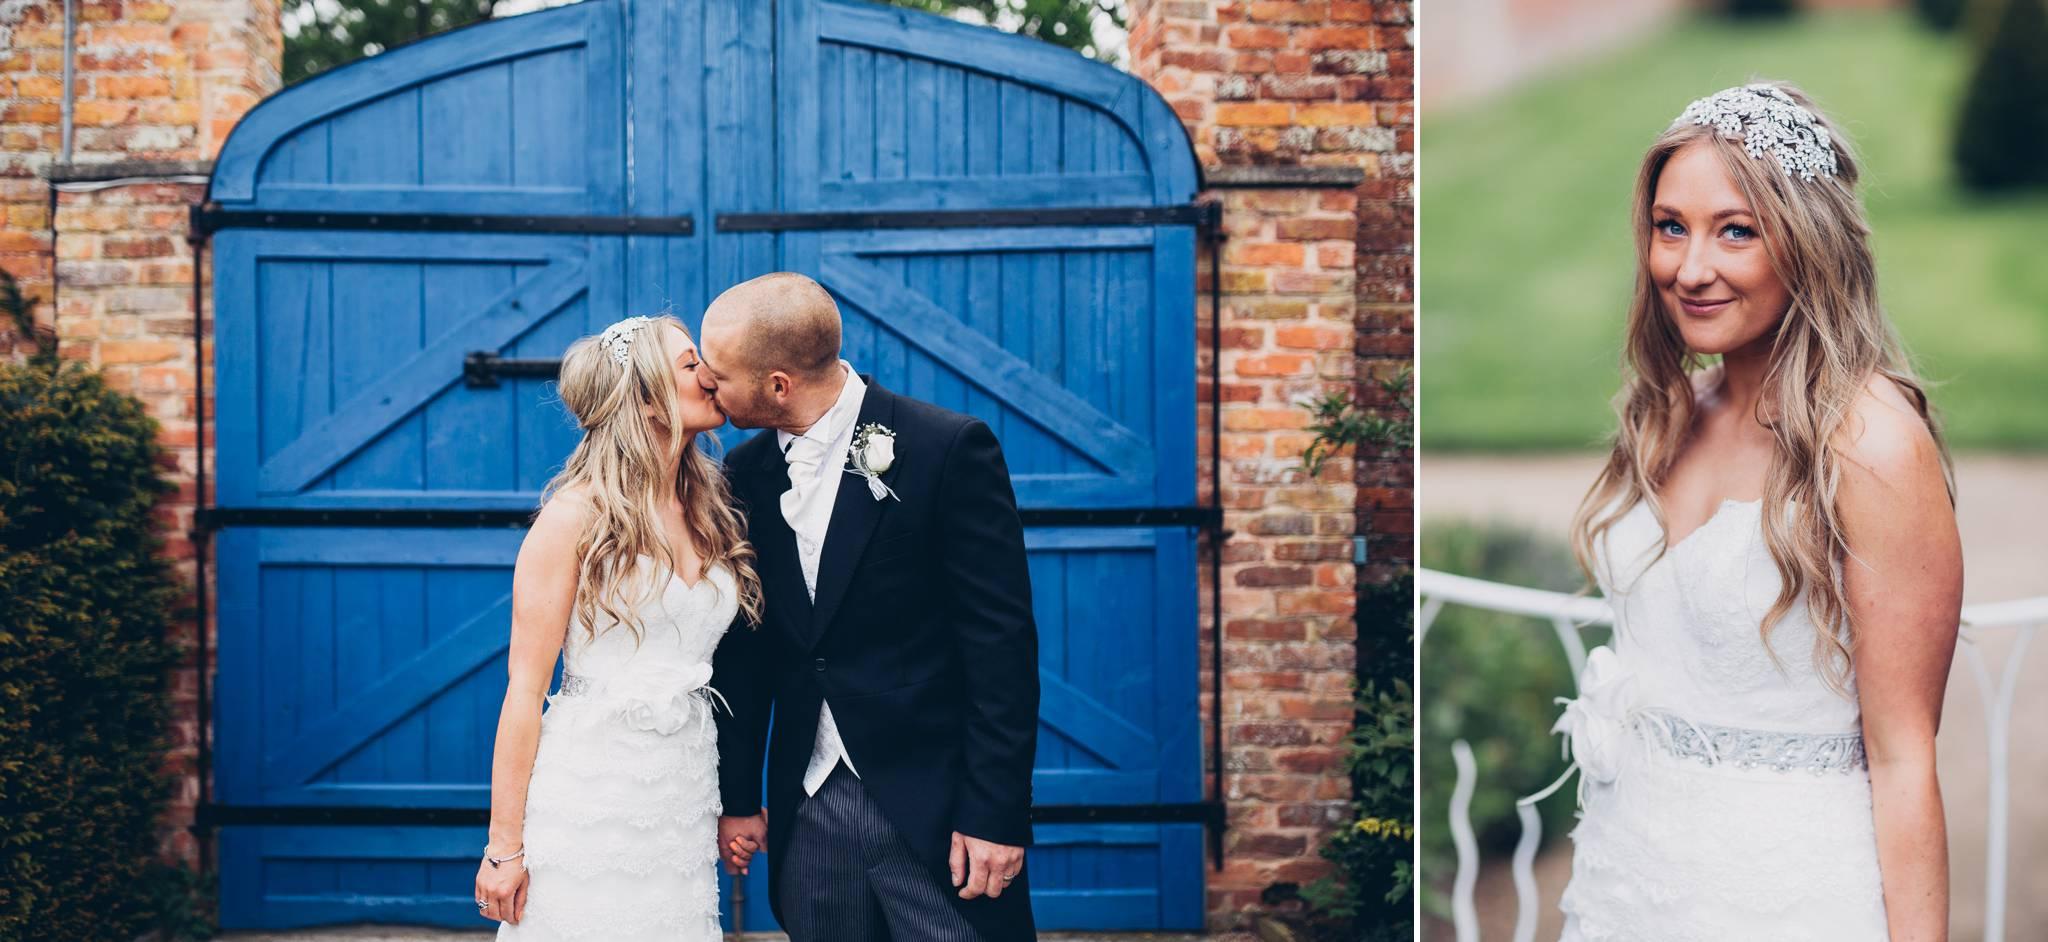 shropshire-wedding-photography 19.jpg